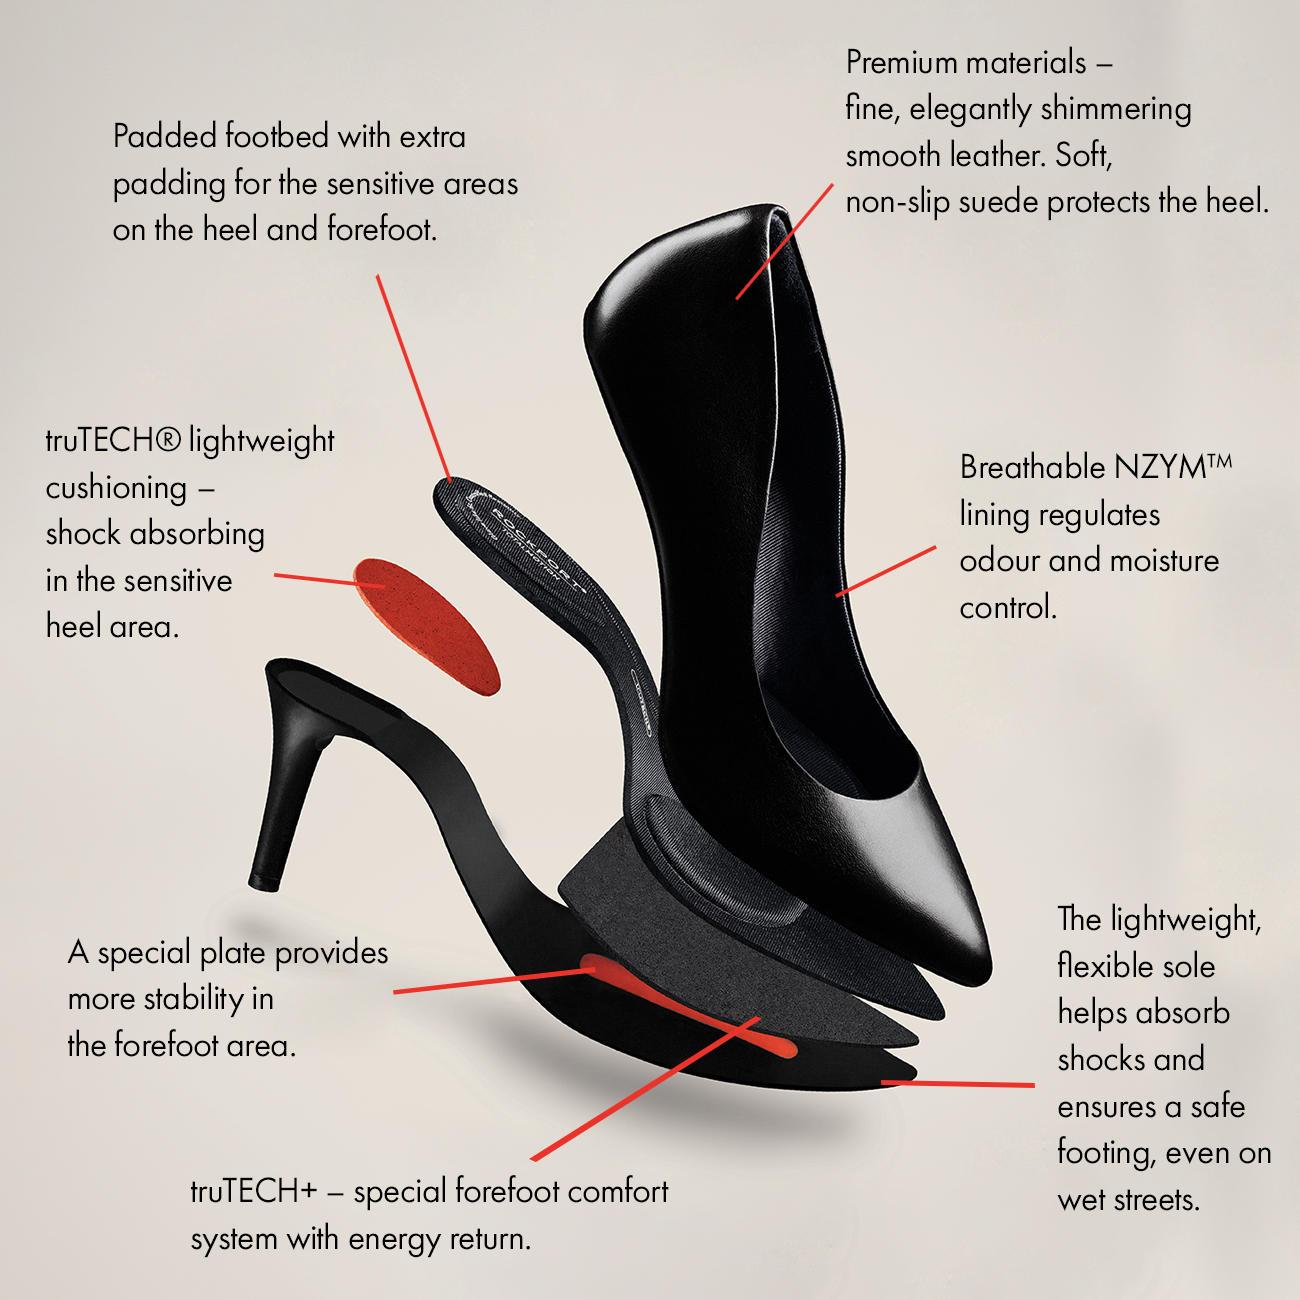 Rockport® High-heeled Travel Shoes